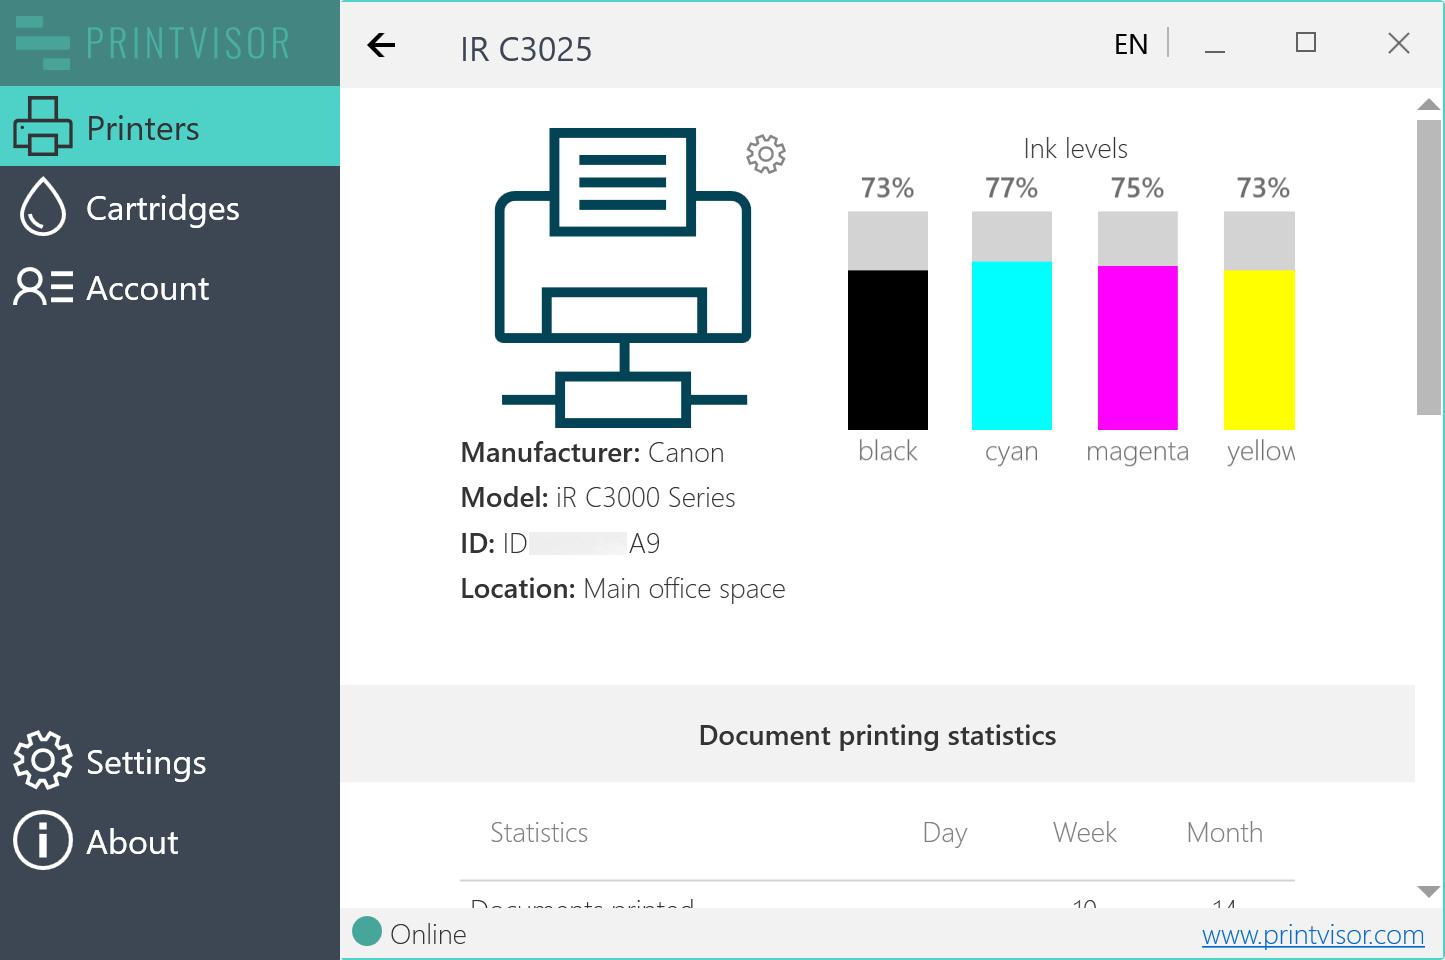 PrintVisor interface overview